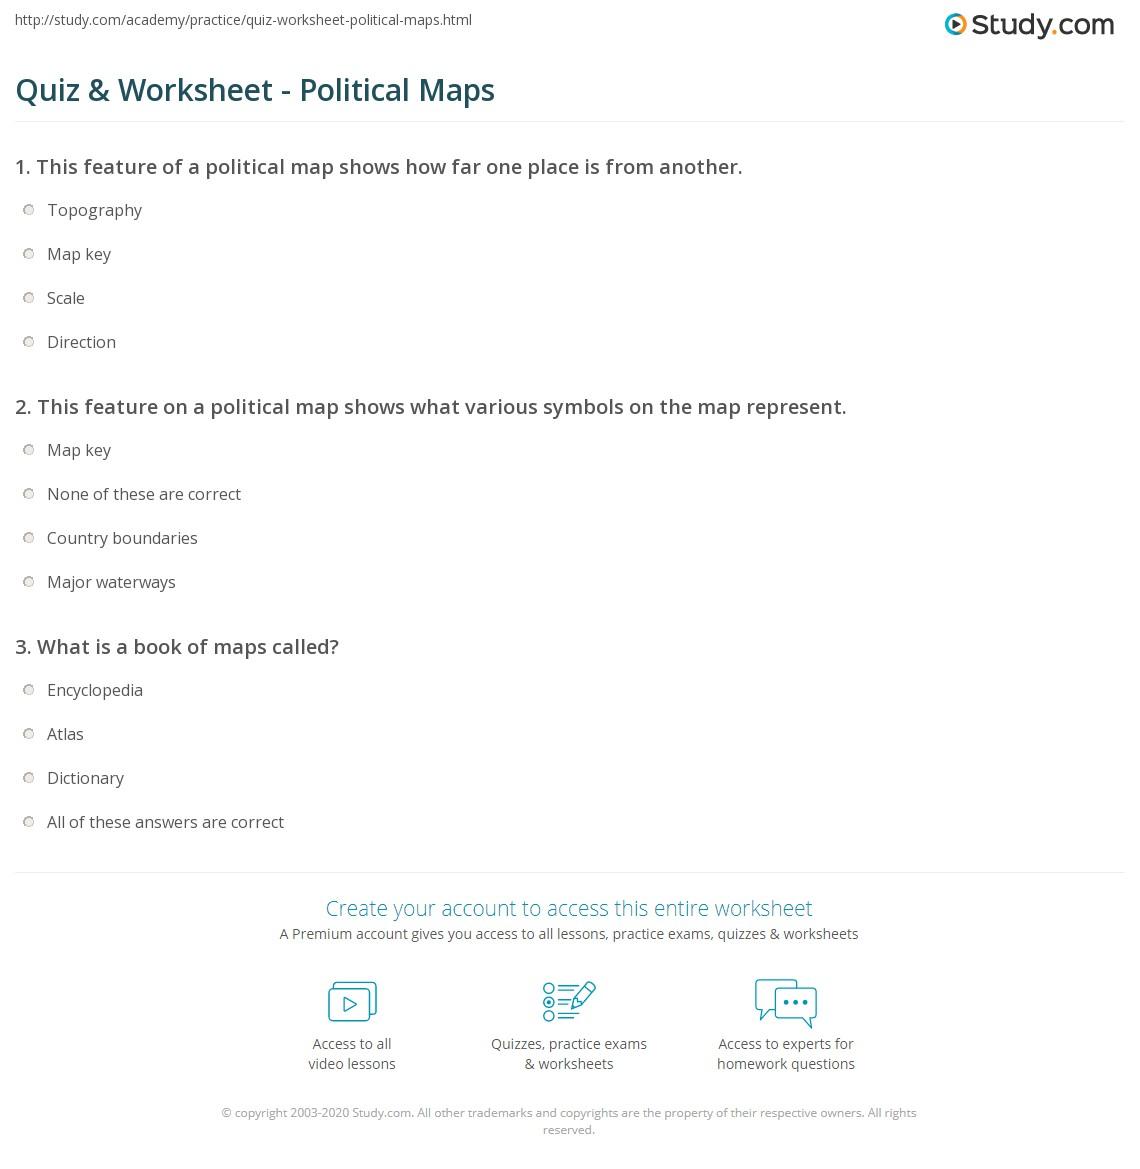 Political Map Worksheet.Quiz Worksheet Political Maps Study Com